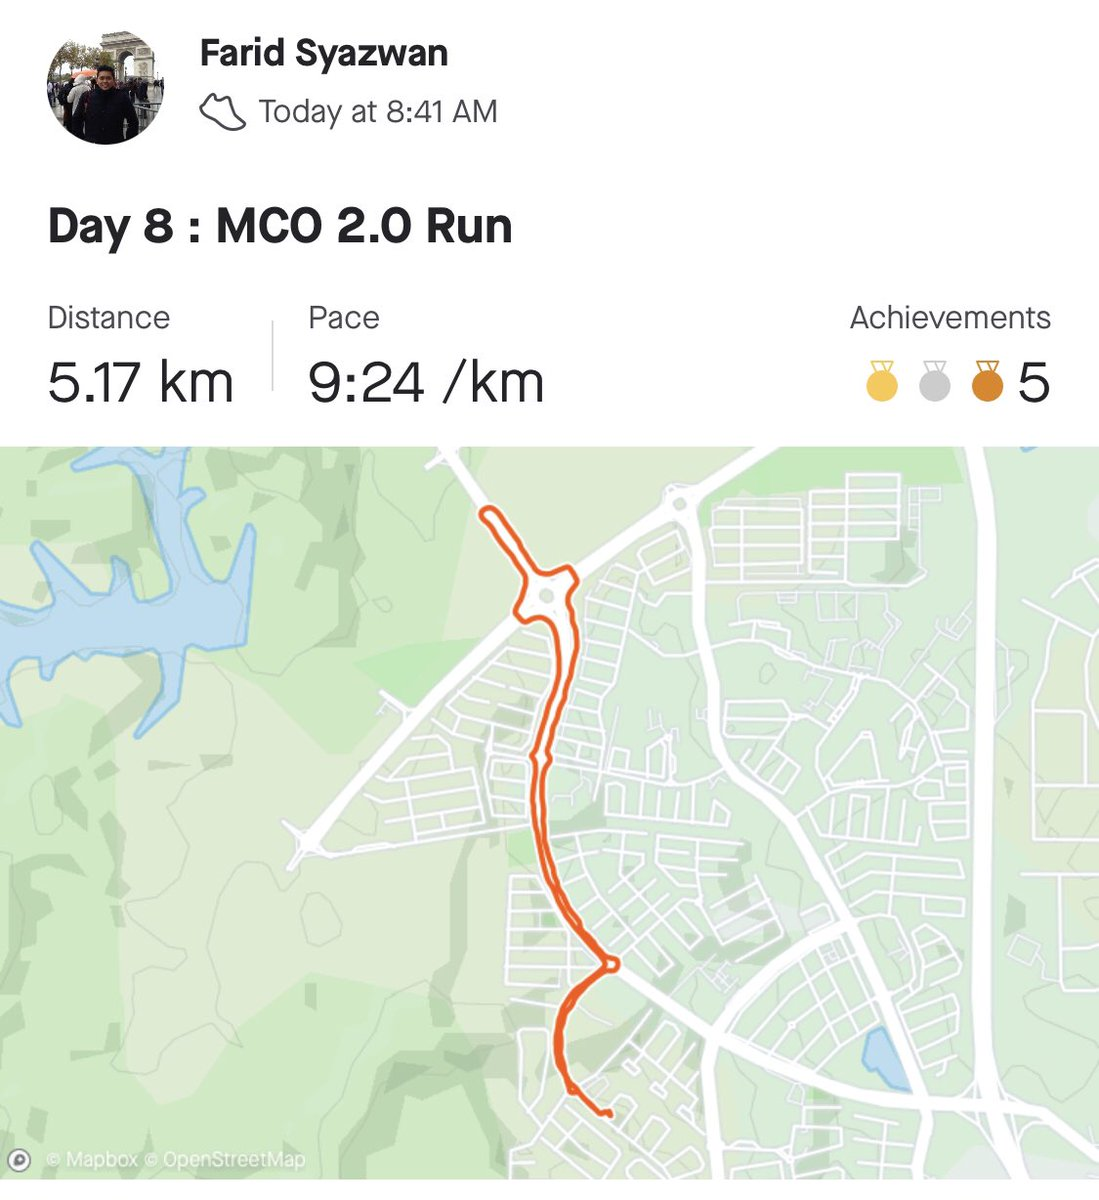 Day 8 : MCO 2.0 Run 🏃🏻   Kalau la kat sini ada sungai, syok gila lepas Jog terjun sungai 🏊♂️ https://t.co/MjP6Cy9SoY